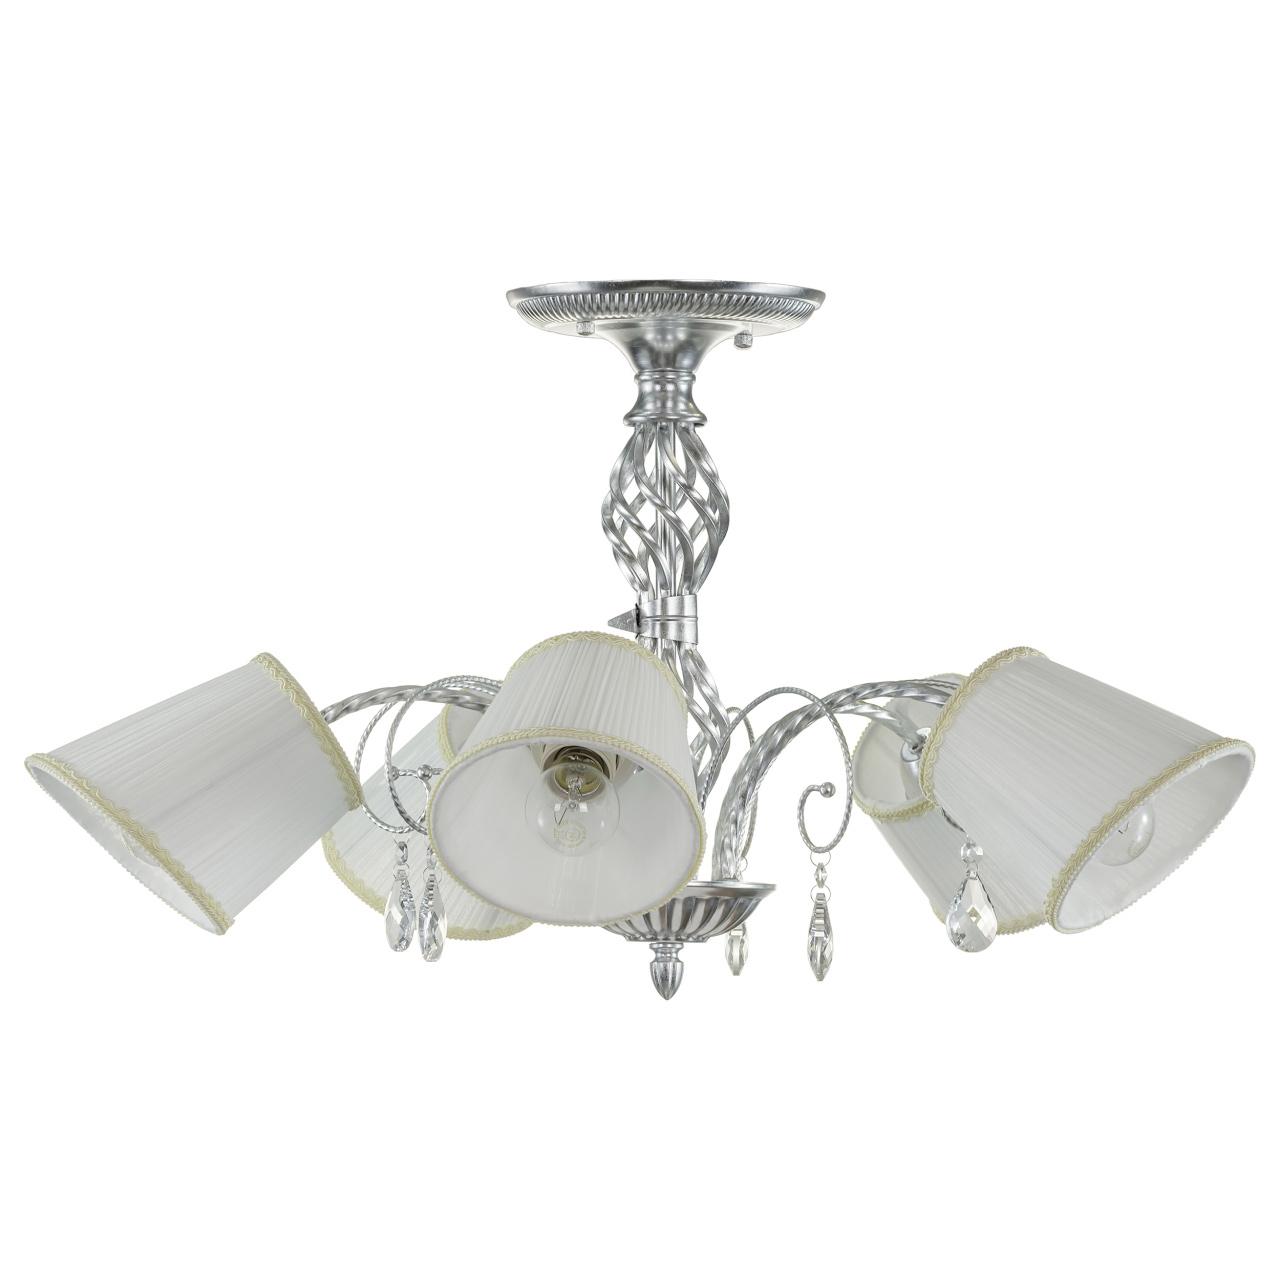 Люстра потолочная Esedra 5x40W E27 silver foil ткань Lightstar 796059